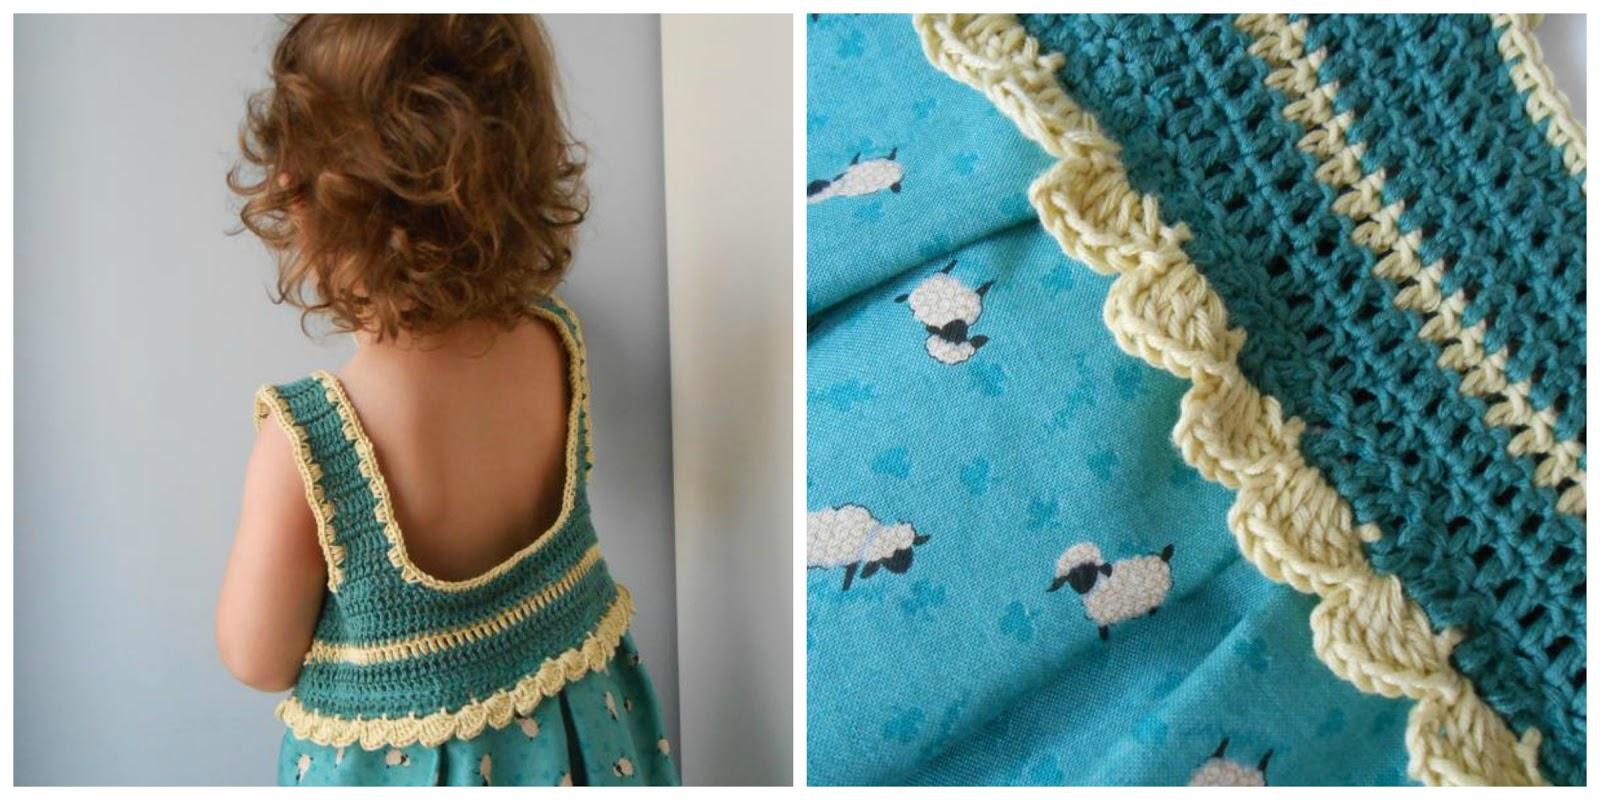 love the crochet dress with the lambs ... I looooooove.... looooove ...